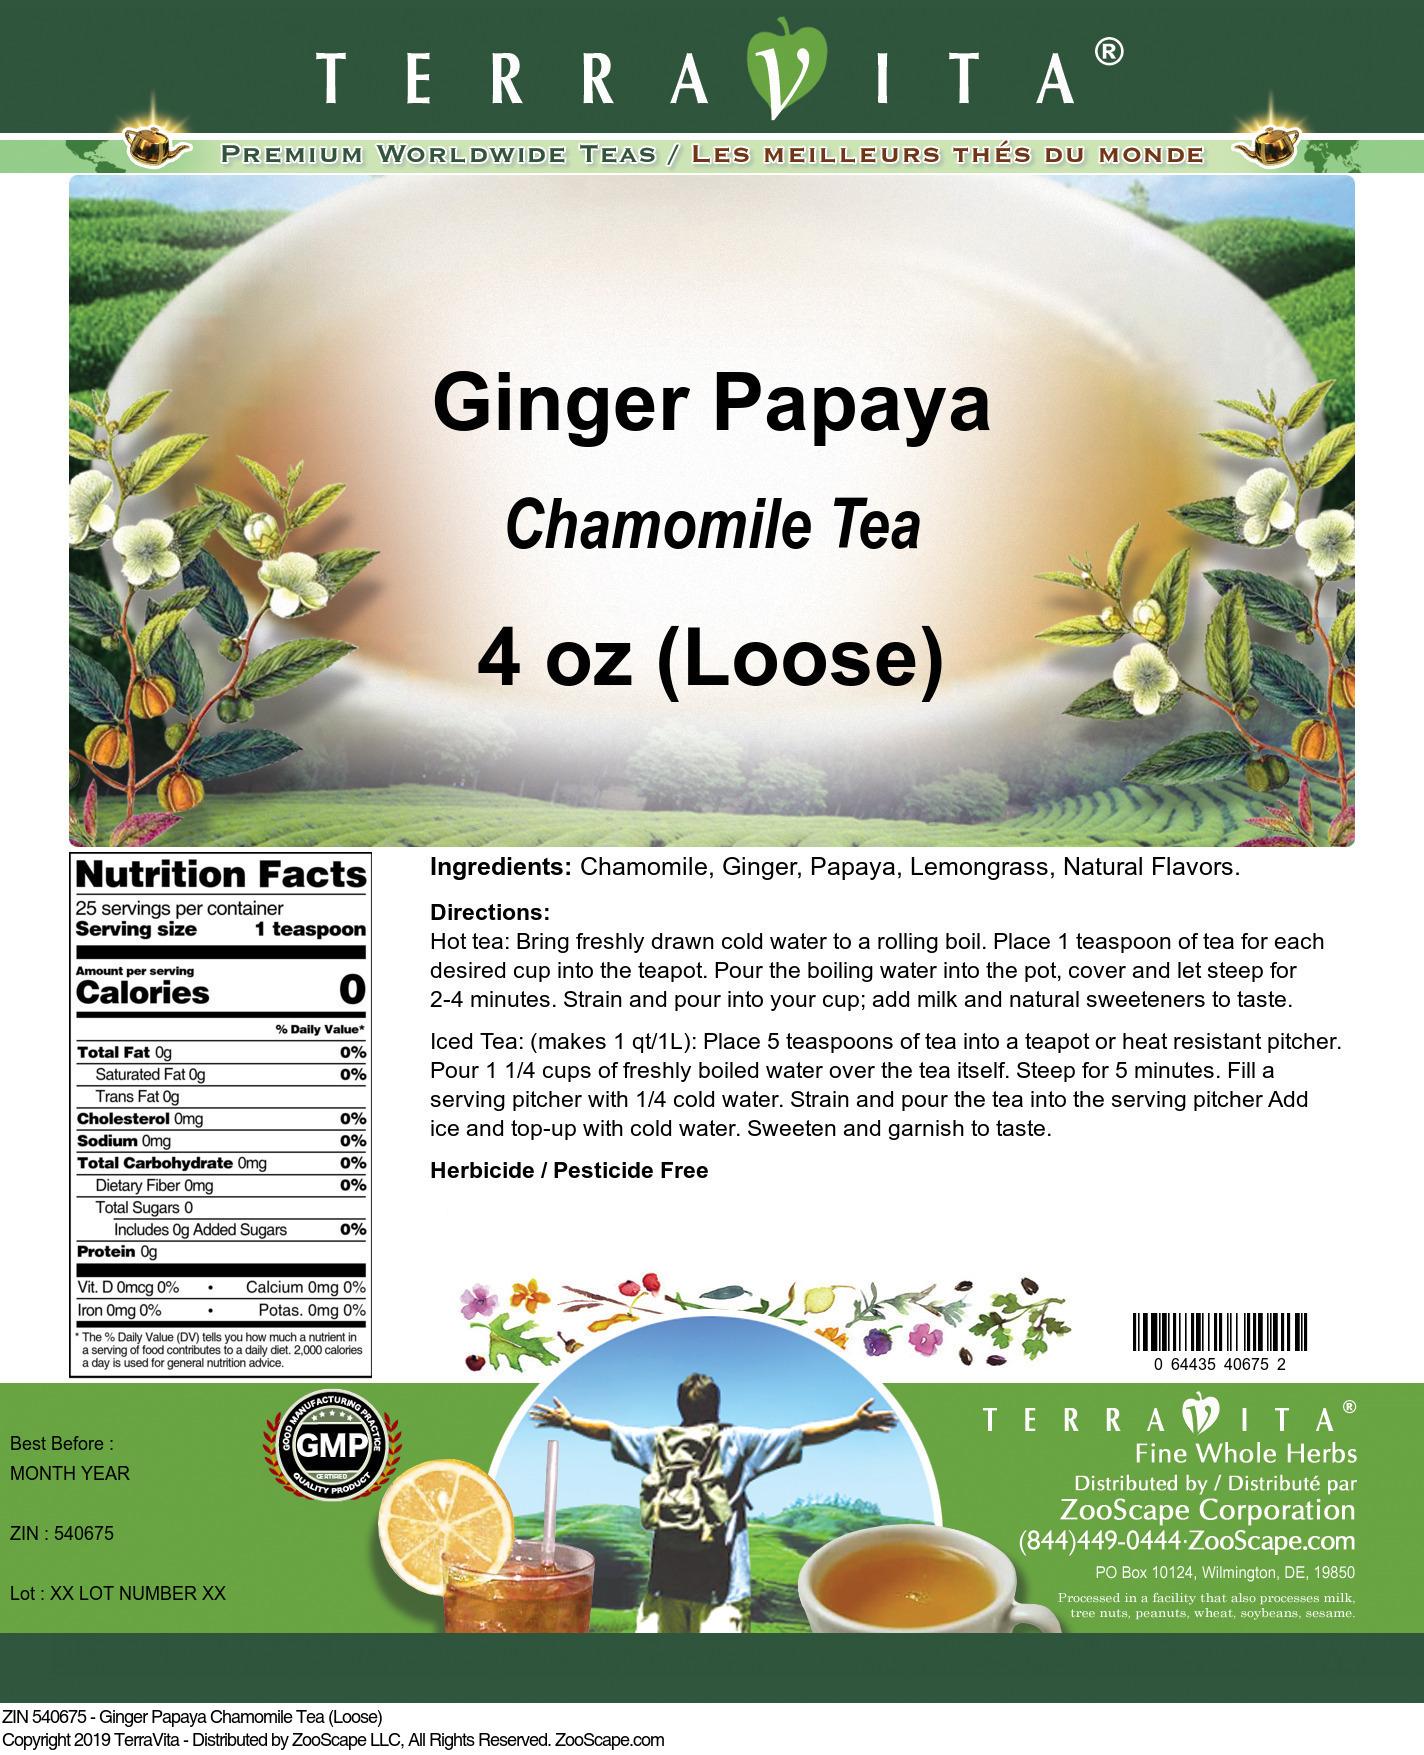 Ginger Papaya Chamomile Tea (Loose)